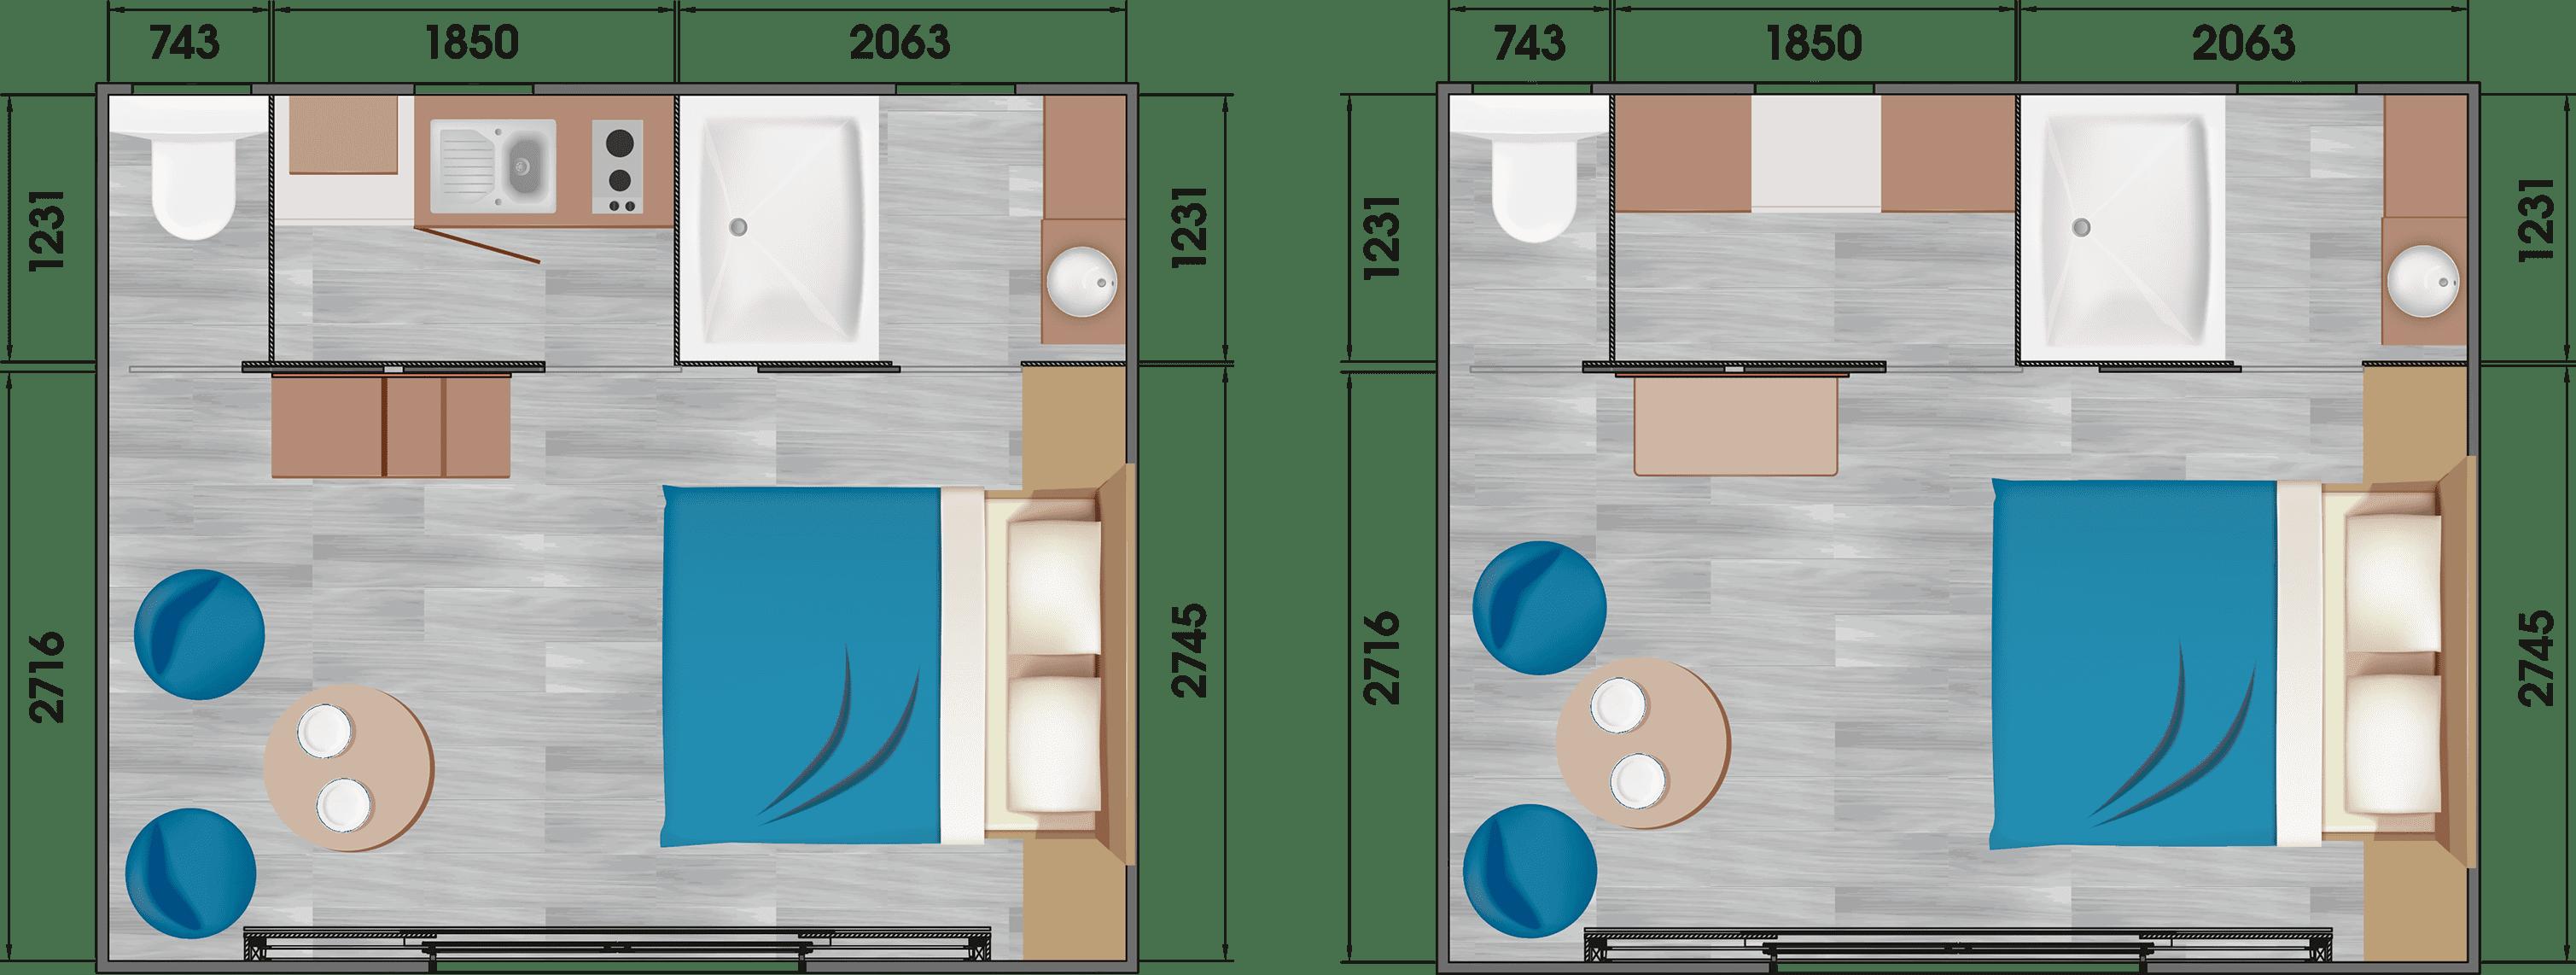 Louisiane Taos S2 - Mobil home Neuf - Taos - 2019 - Zen Mobil homes